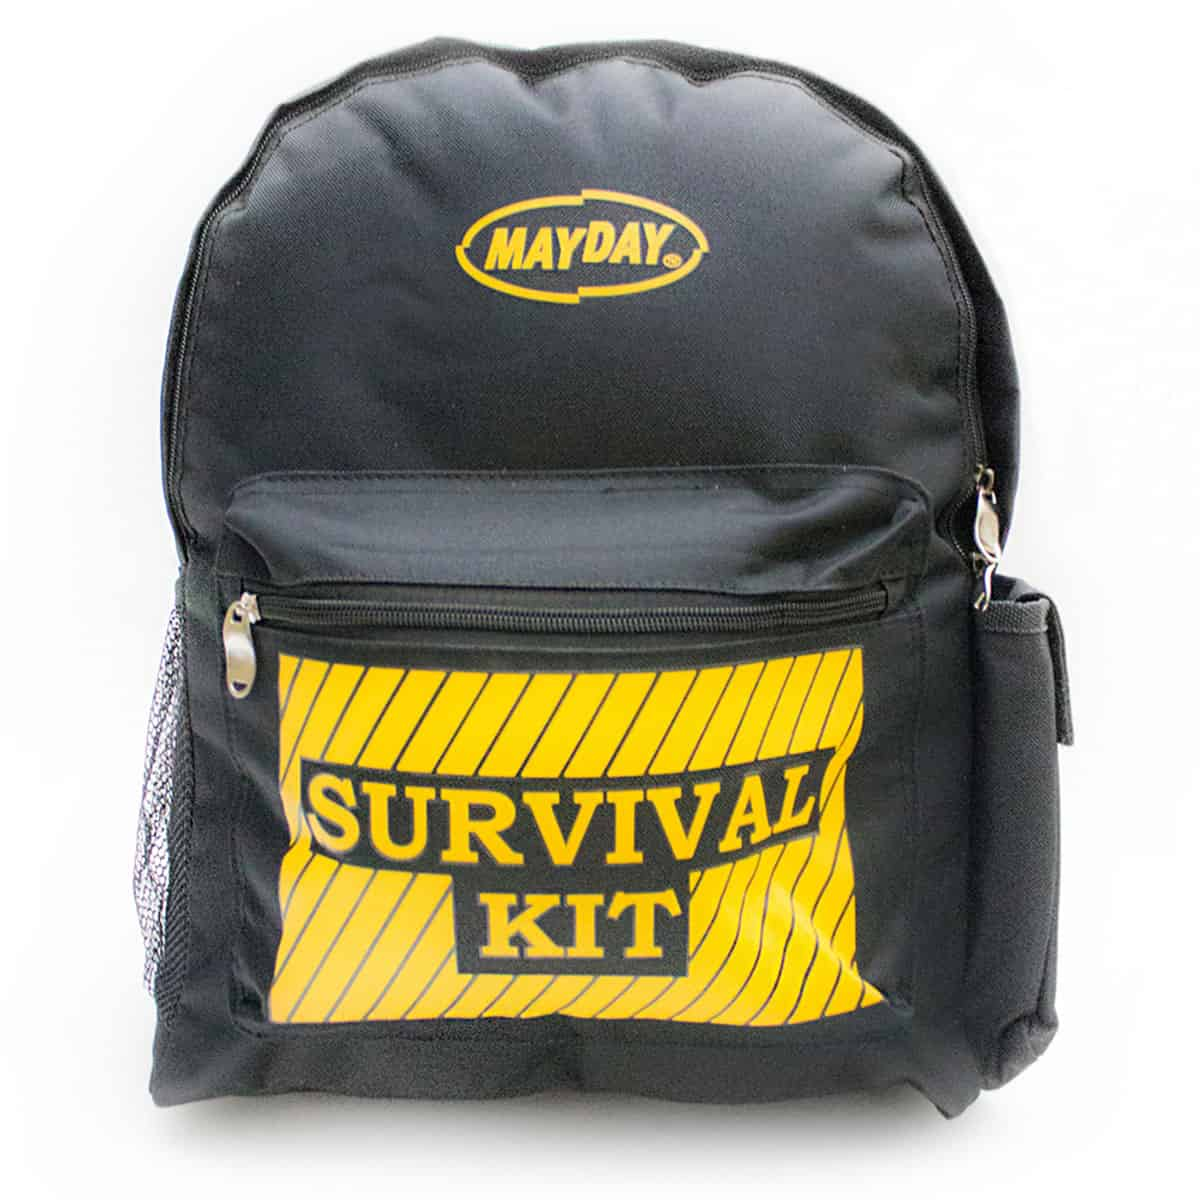 Adult Size Back Pack